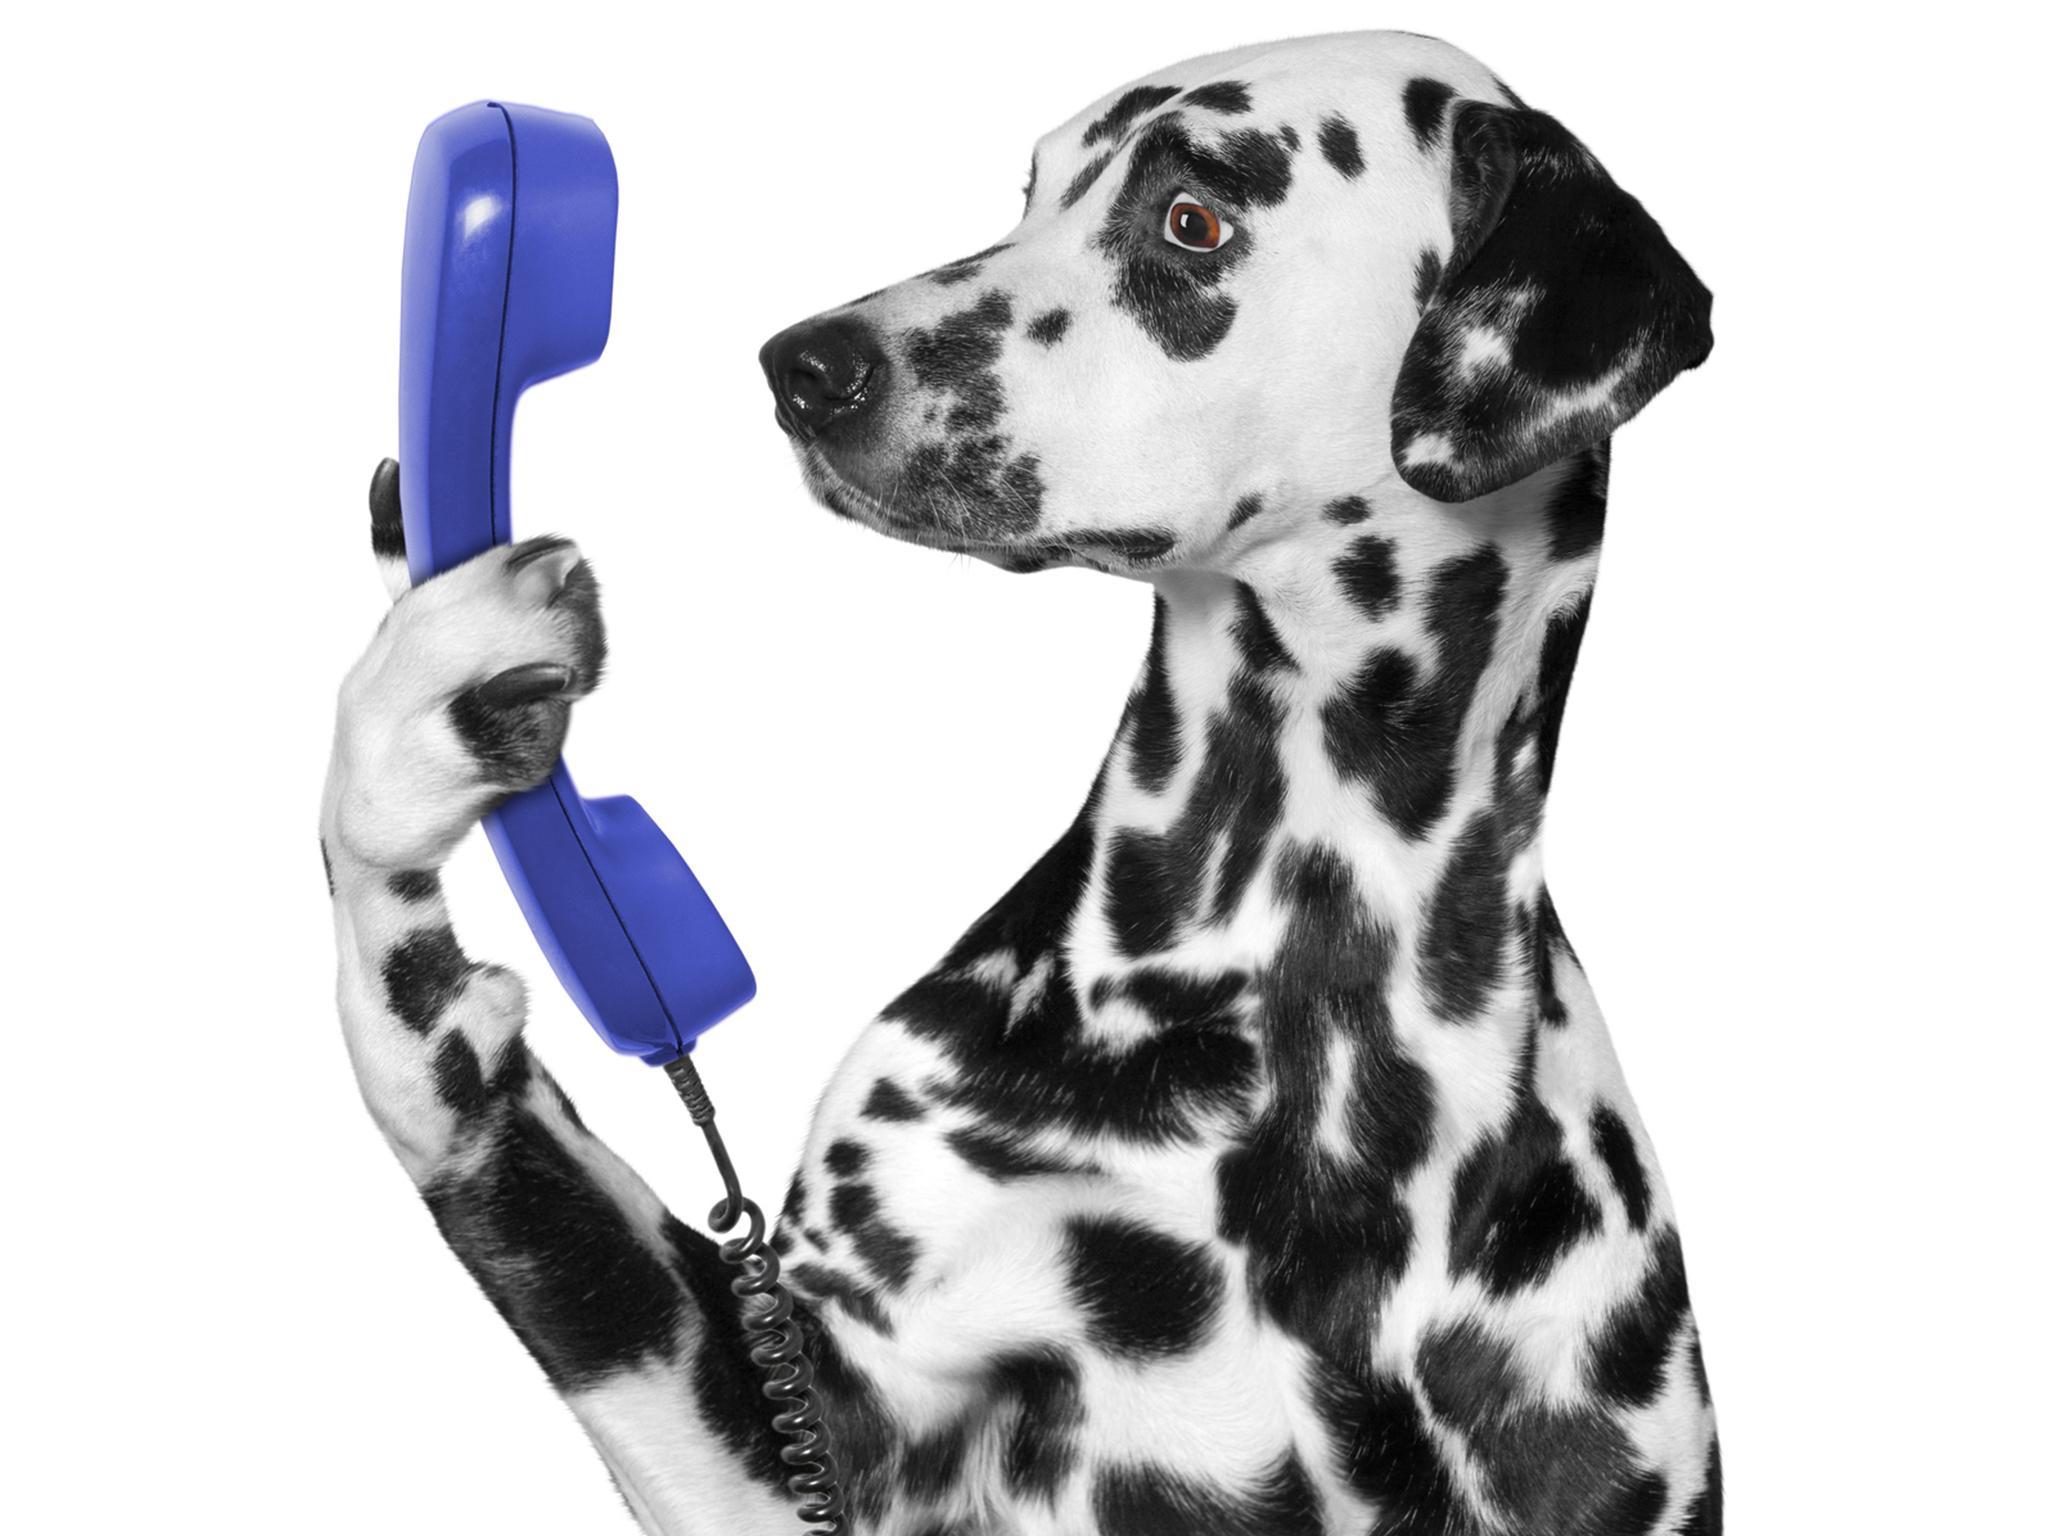 Landline phones review uk dating